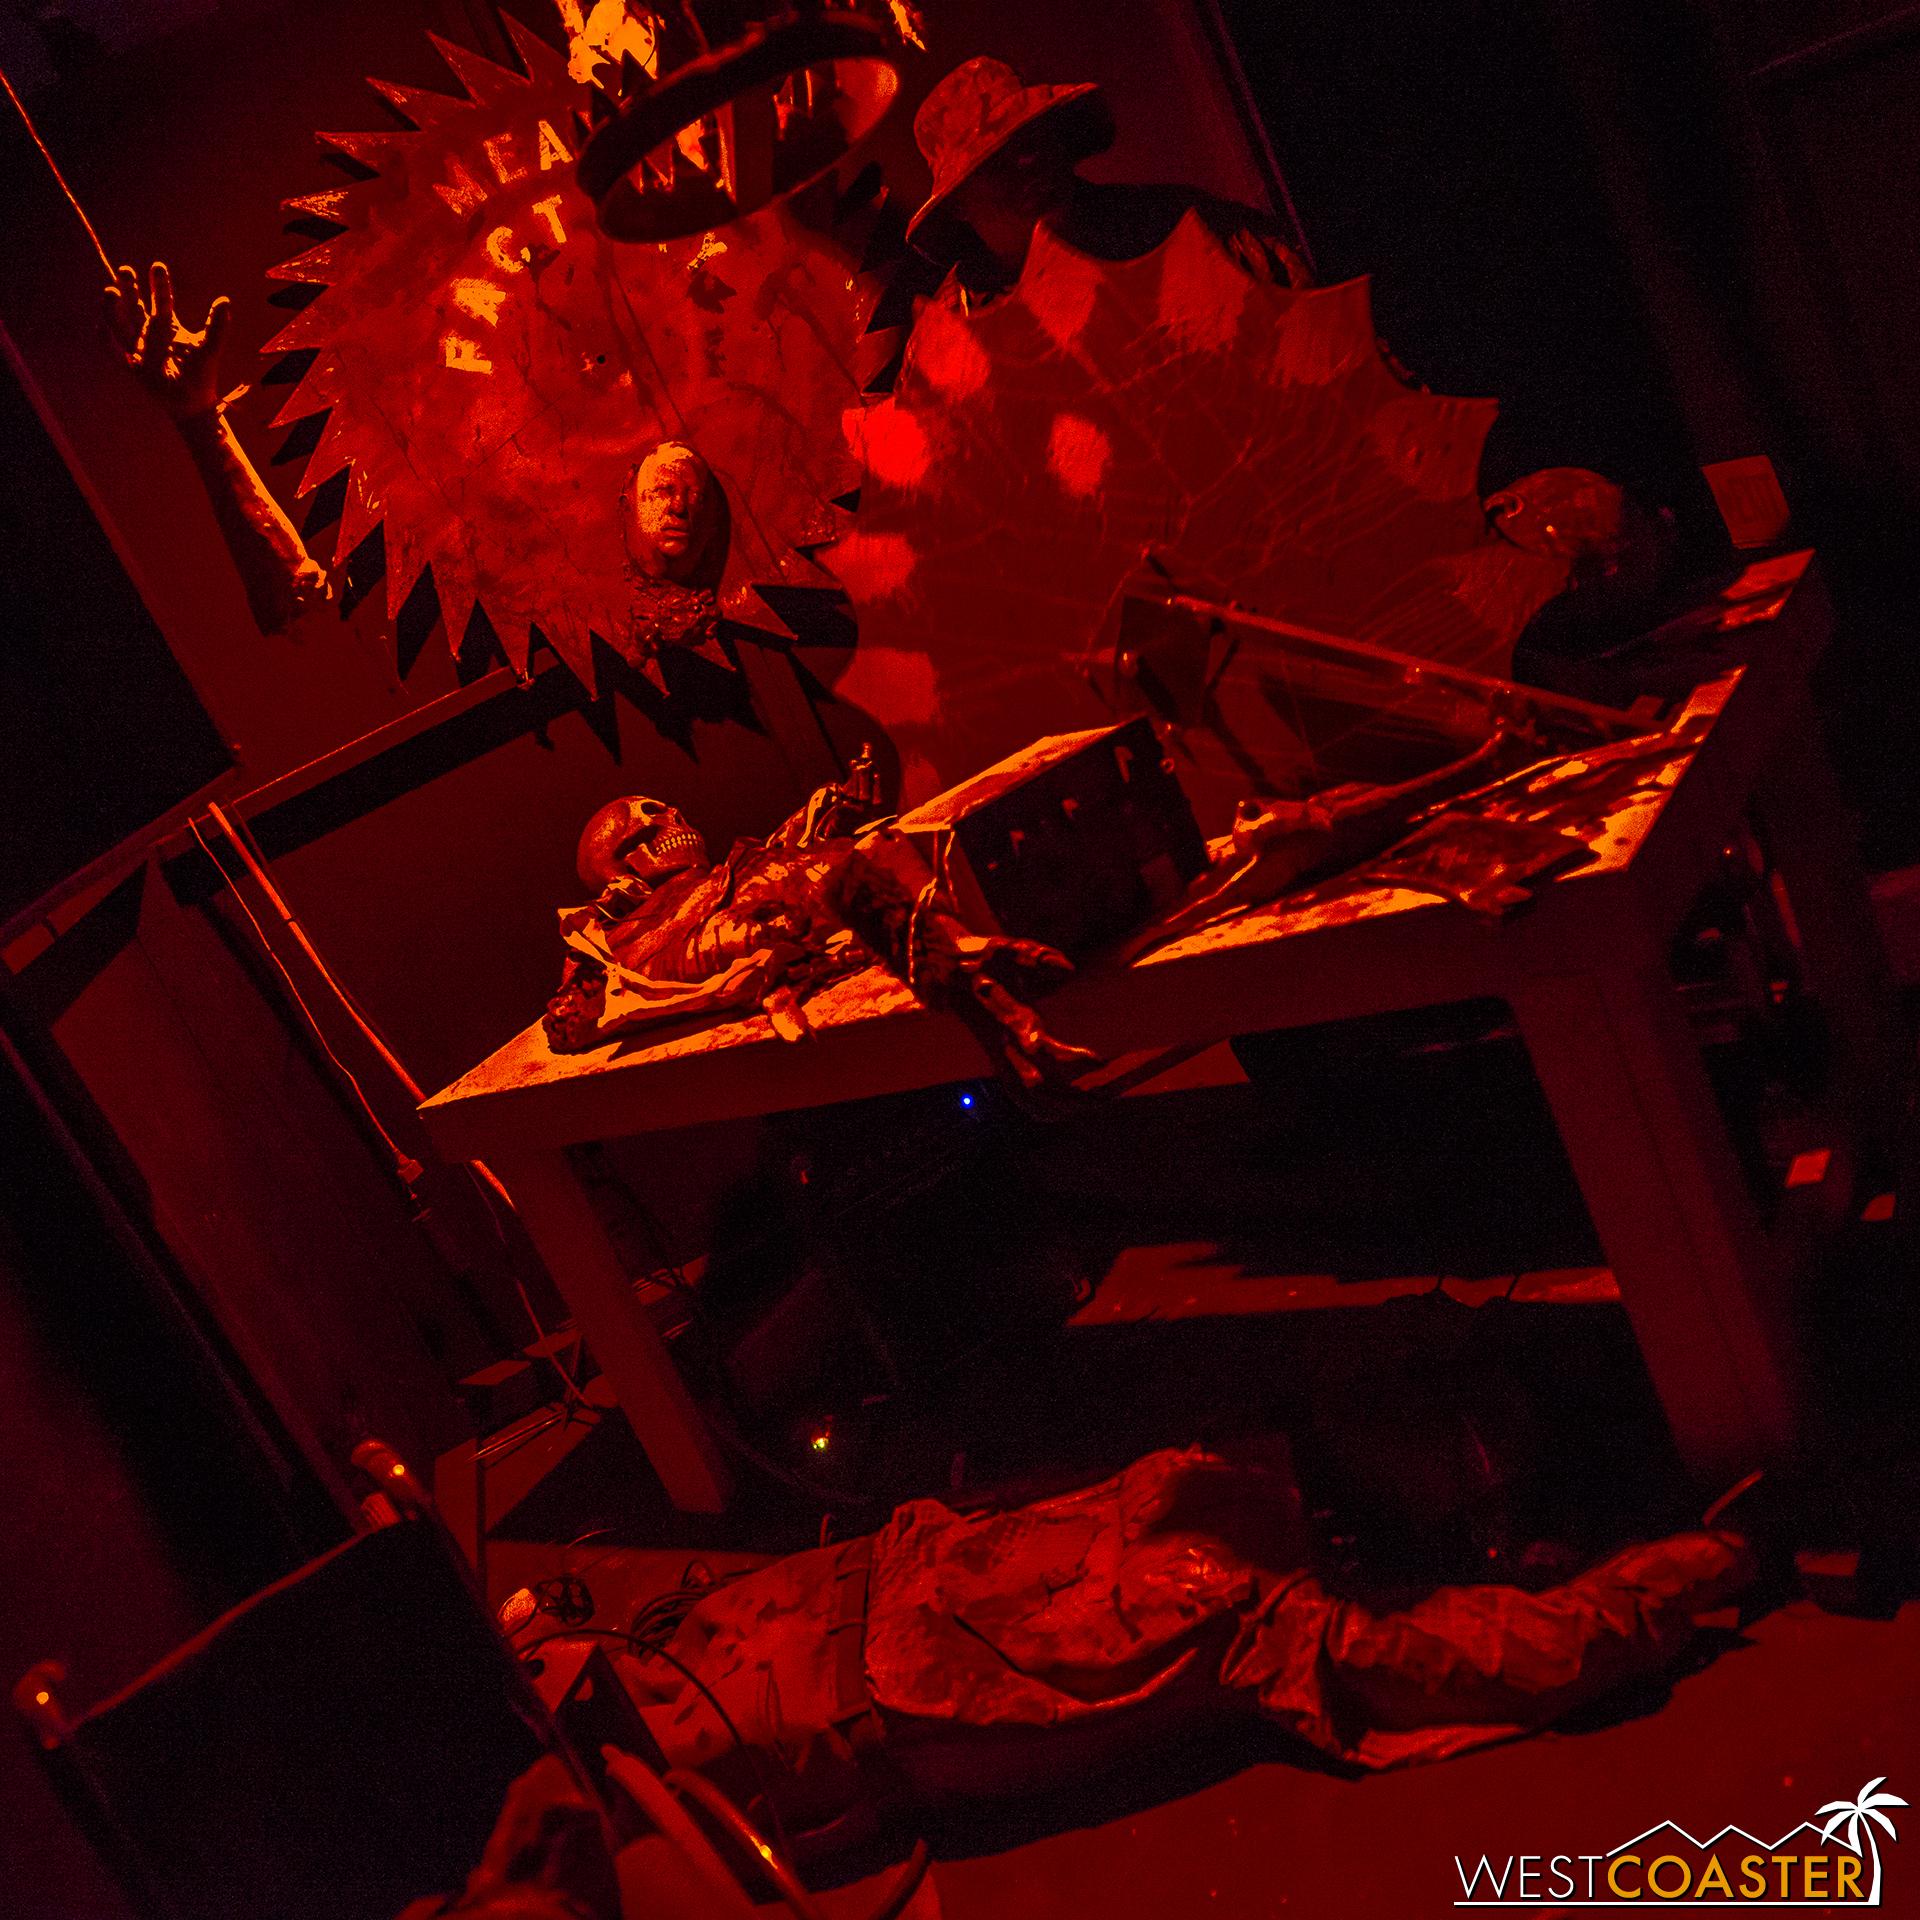 DeadTimeDreams-17_1017-C-DeathWorX-0012.jpg